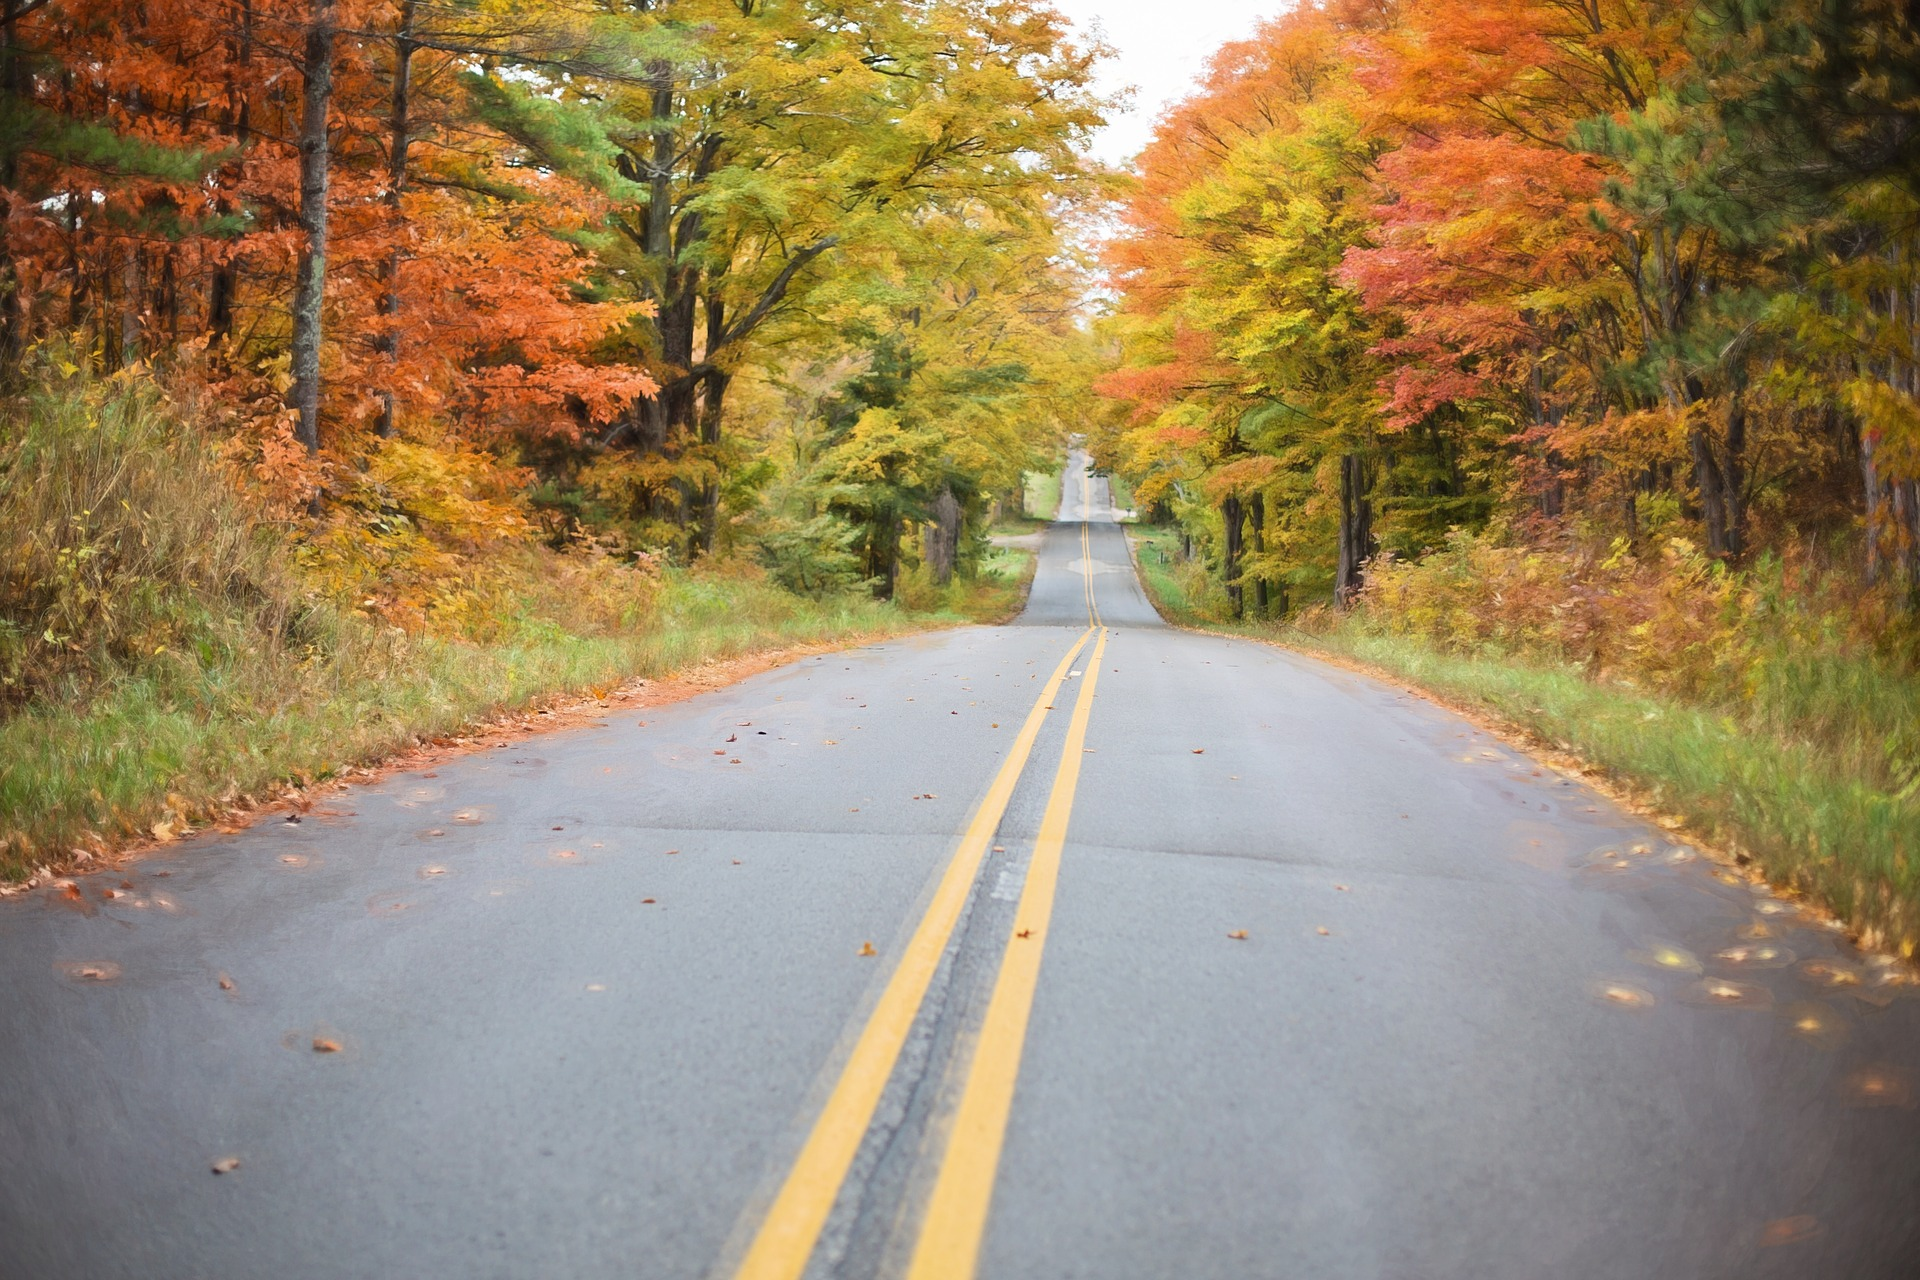 Road in Autumn, Autumn, Color, Fall, Fallen, HQ Photo